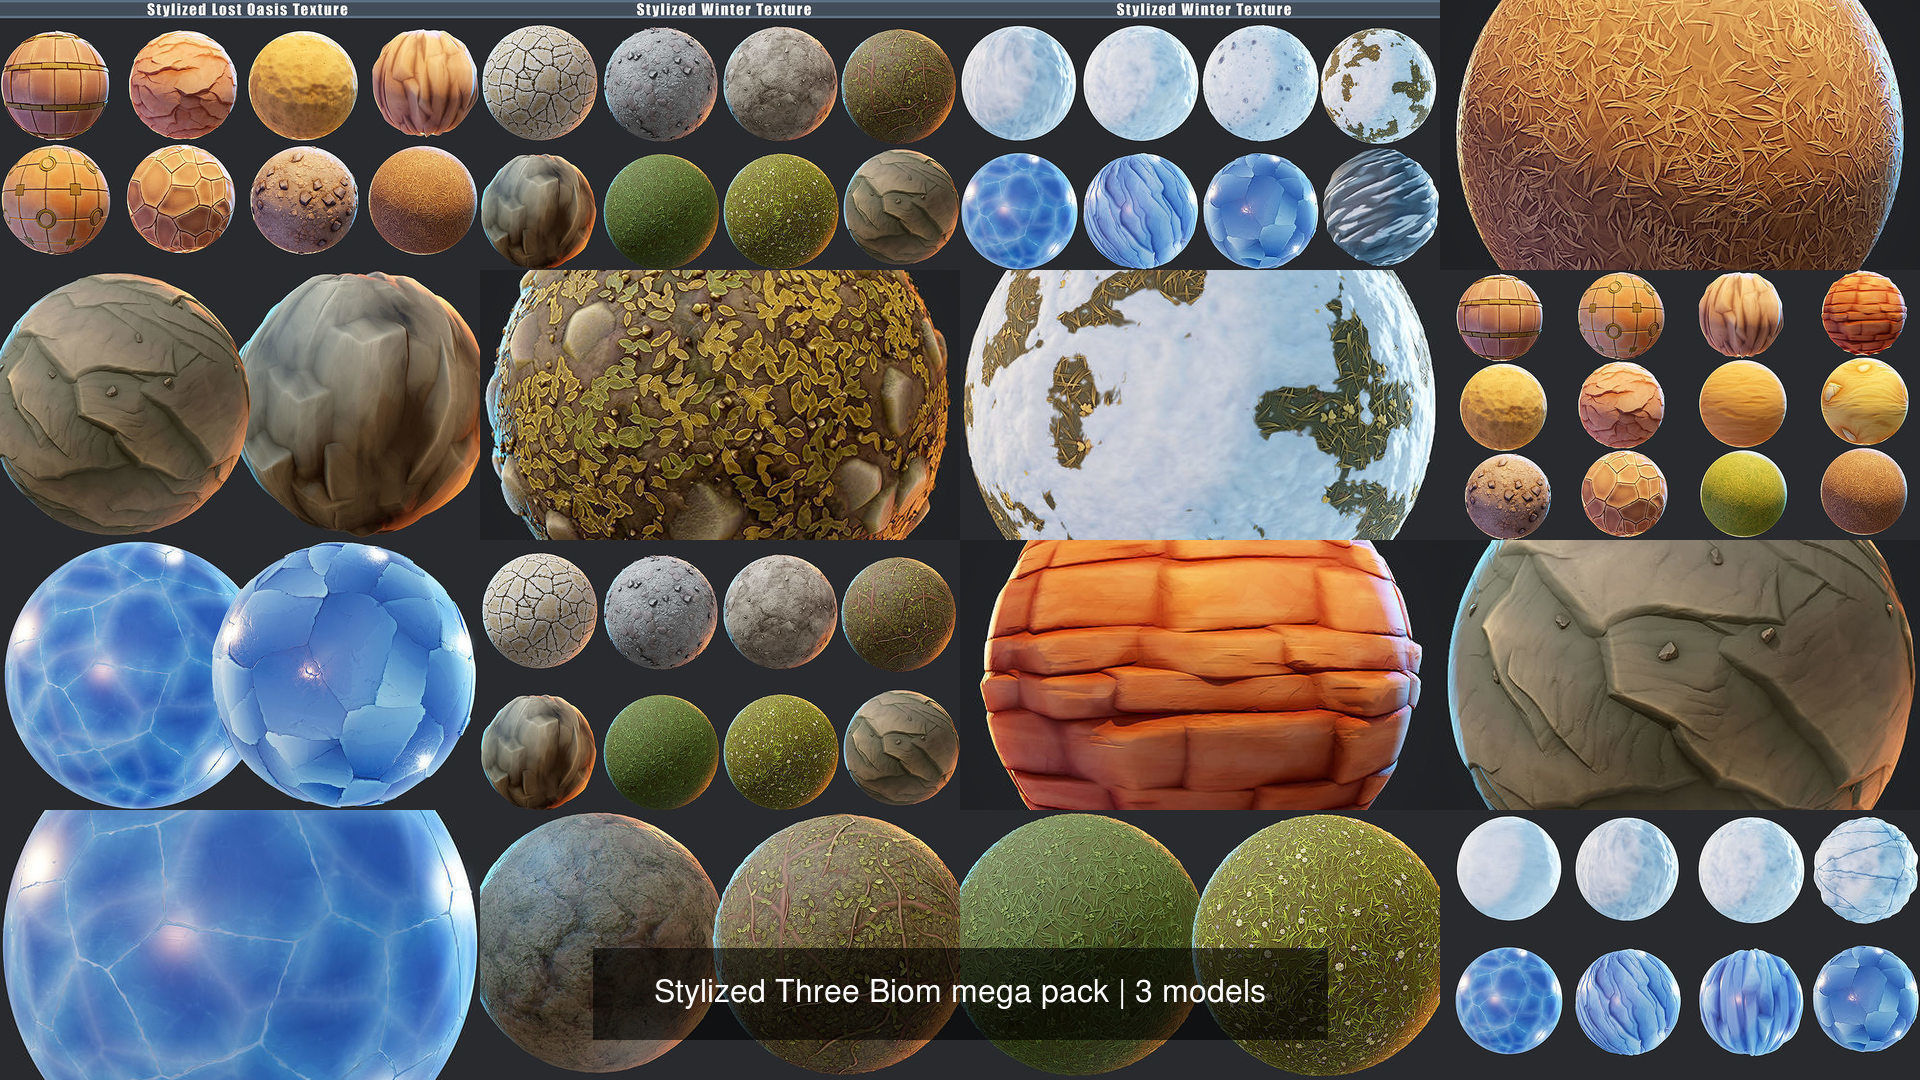 Stylized Three Biom mega pack